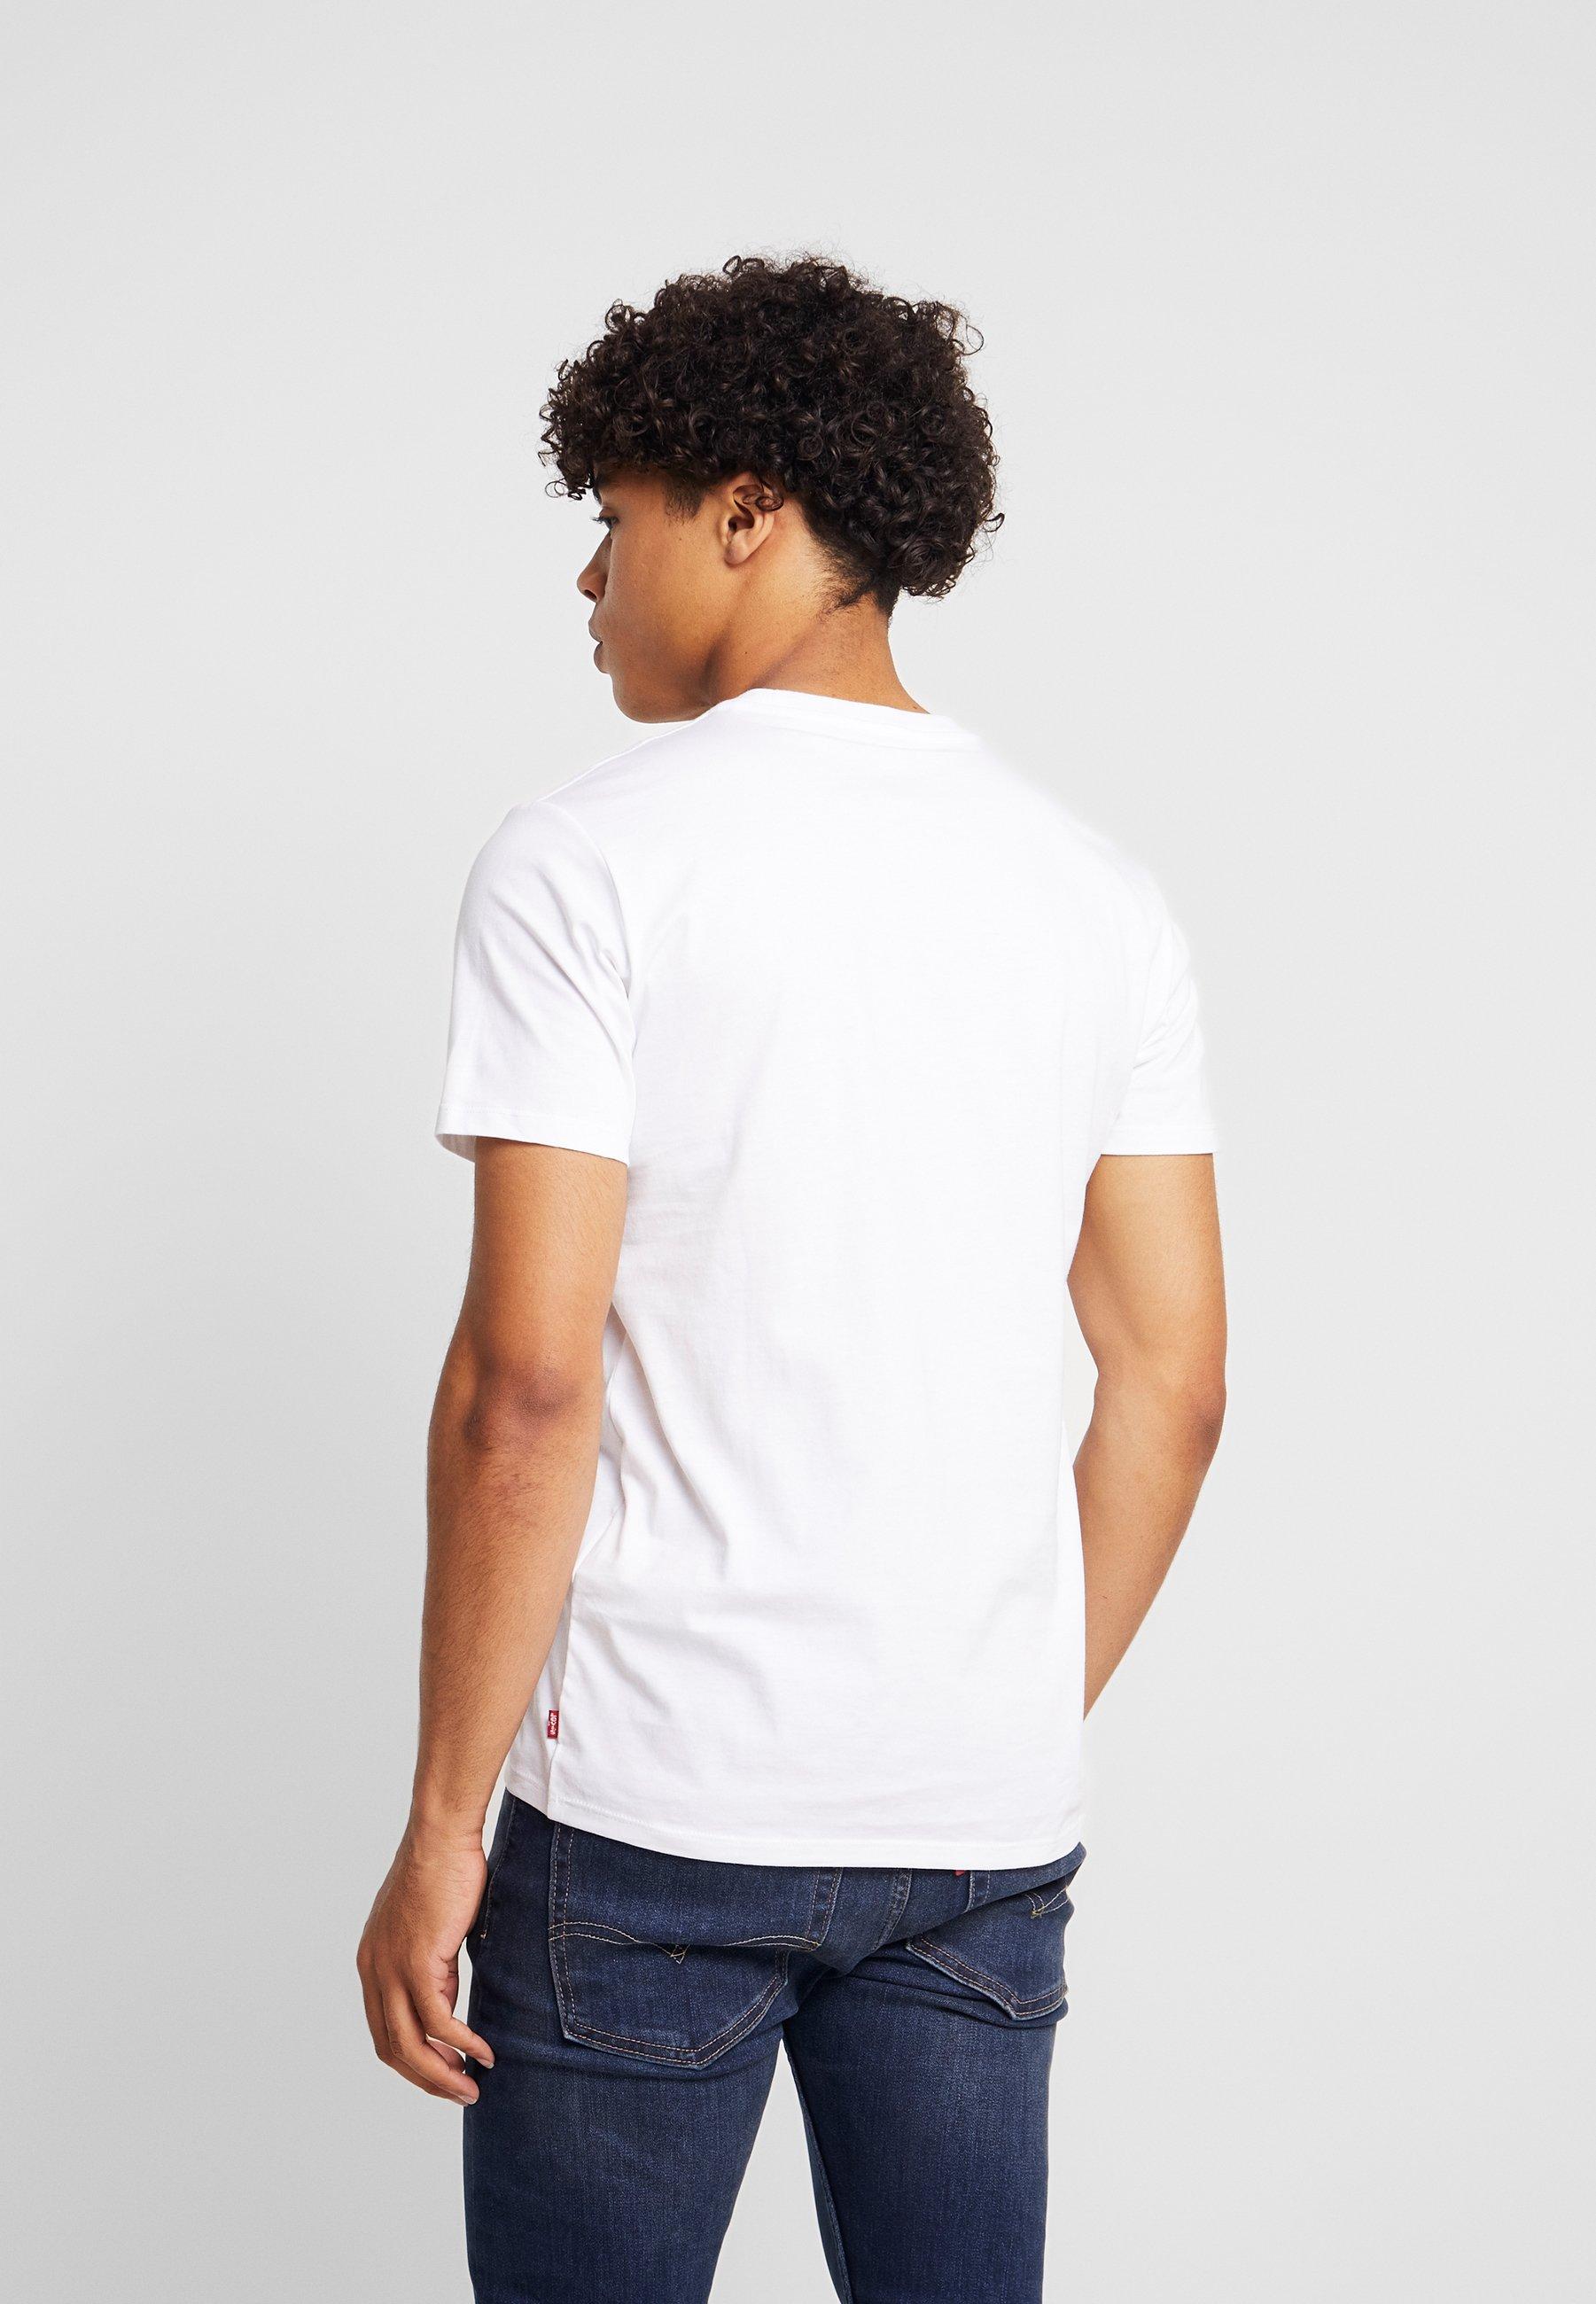 Extra Housemark shirt Imprimé TeeT Levi's® Graphic White O8n0wPyNvm